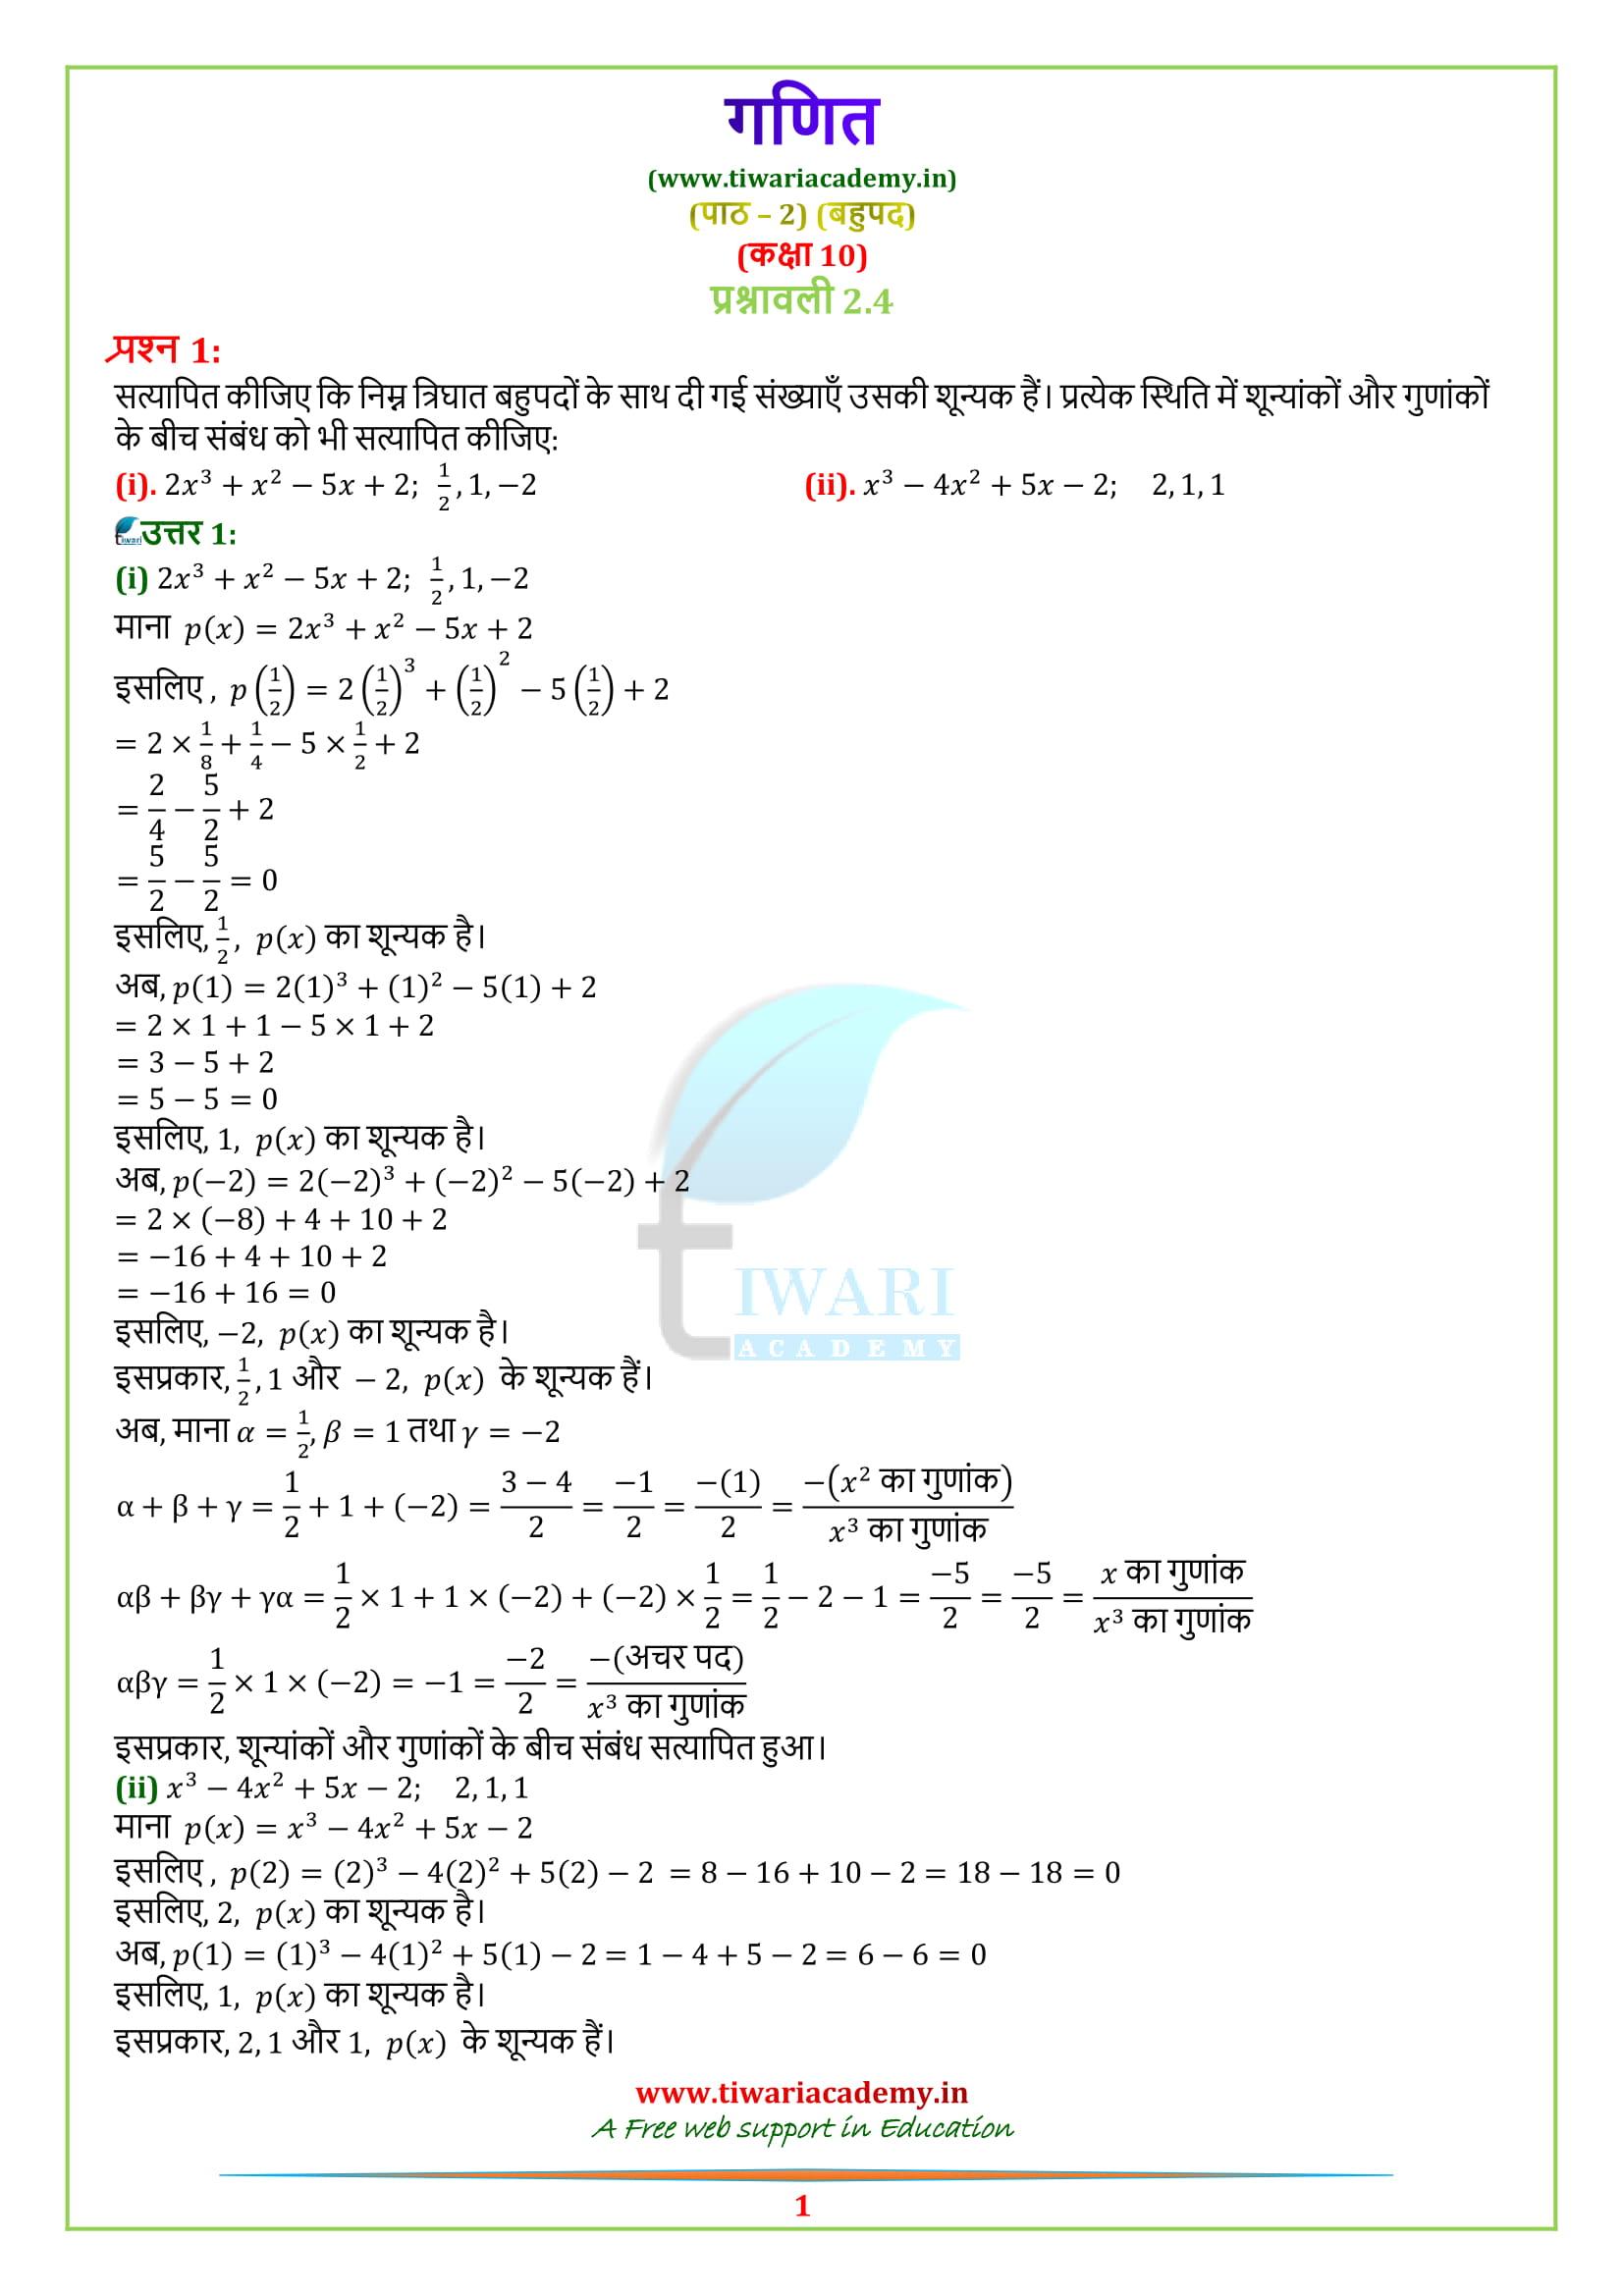 10 Maths Exercise 2.4 in Hindi Medium